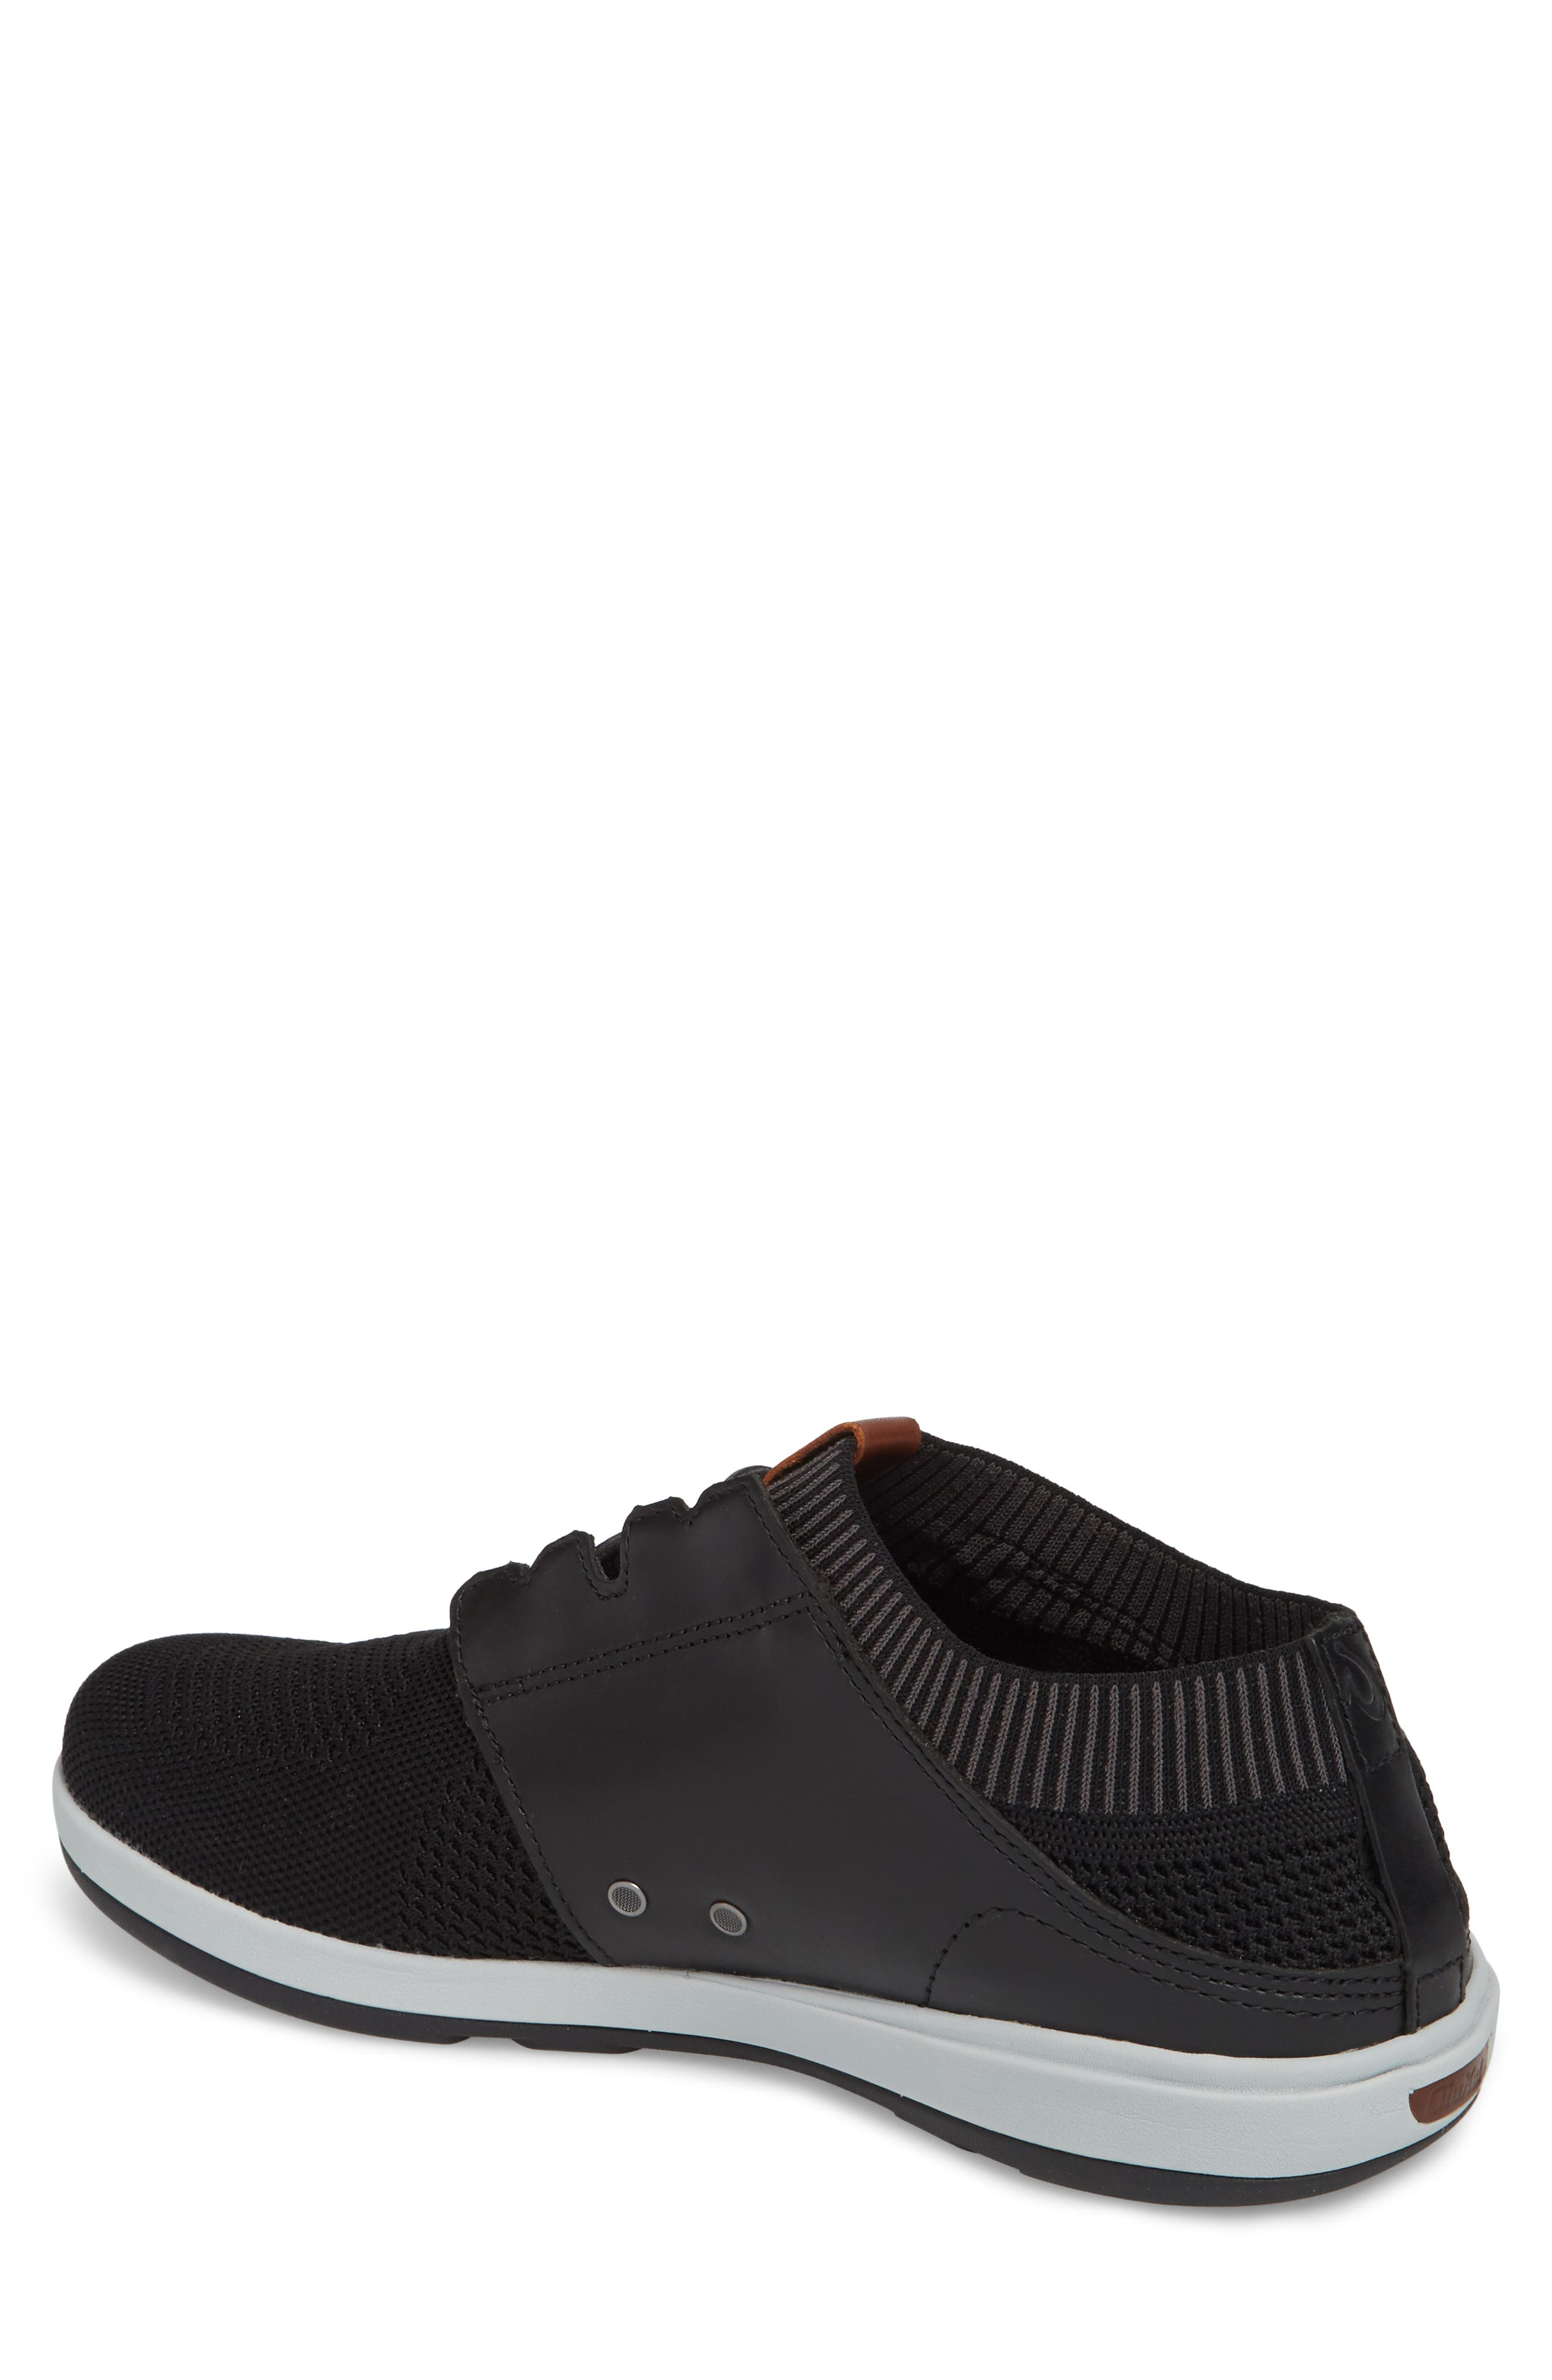 Makia Ulana Sneaker,                             Alternate thumbnail 2, color,                             BLACK/ BLACK